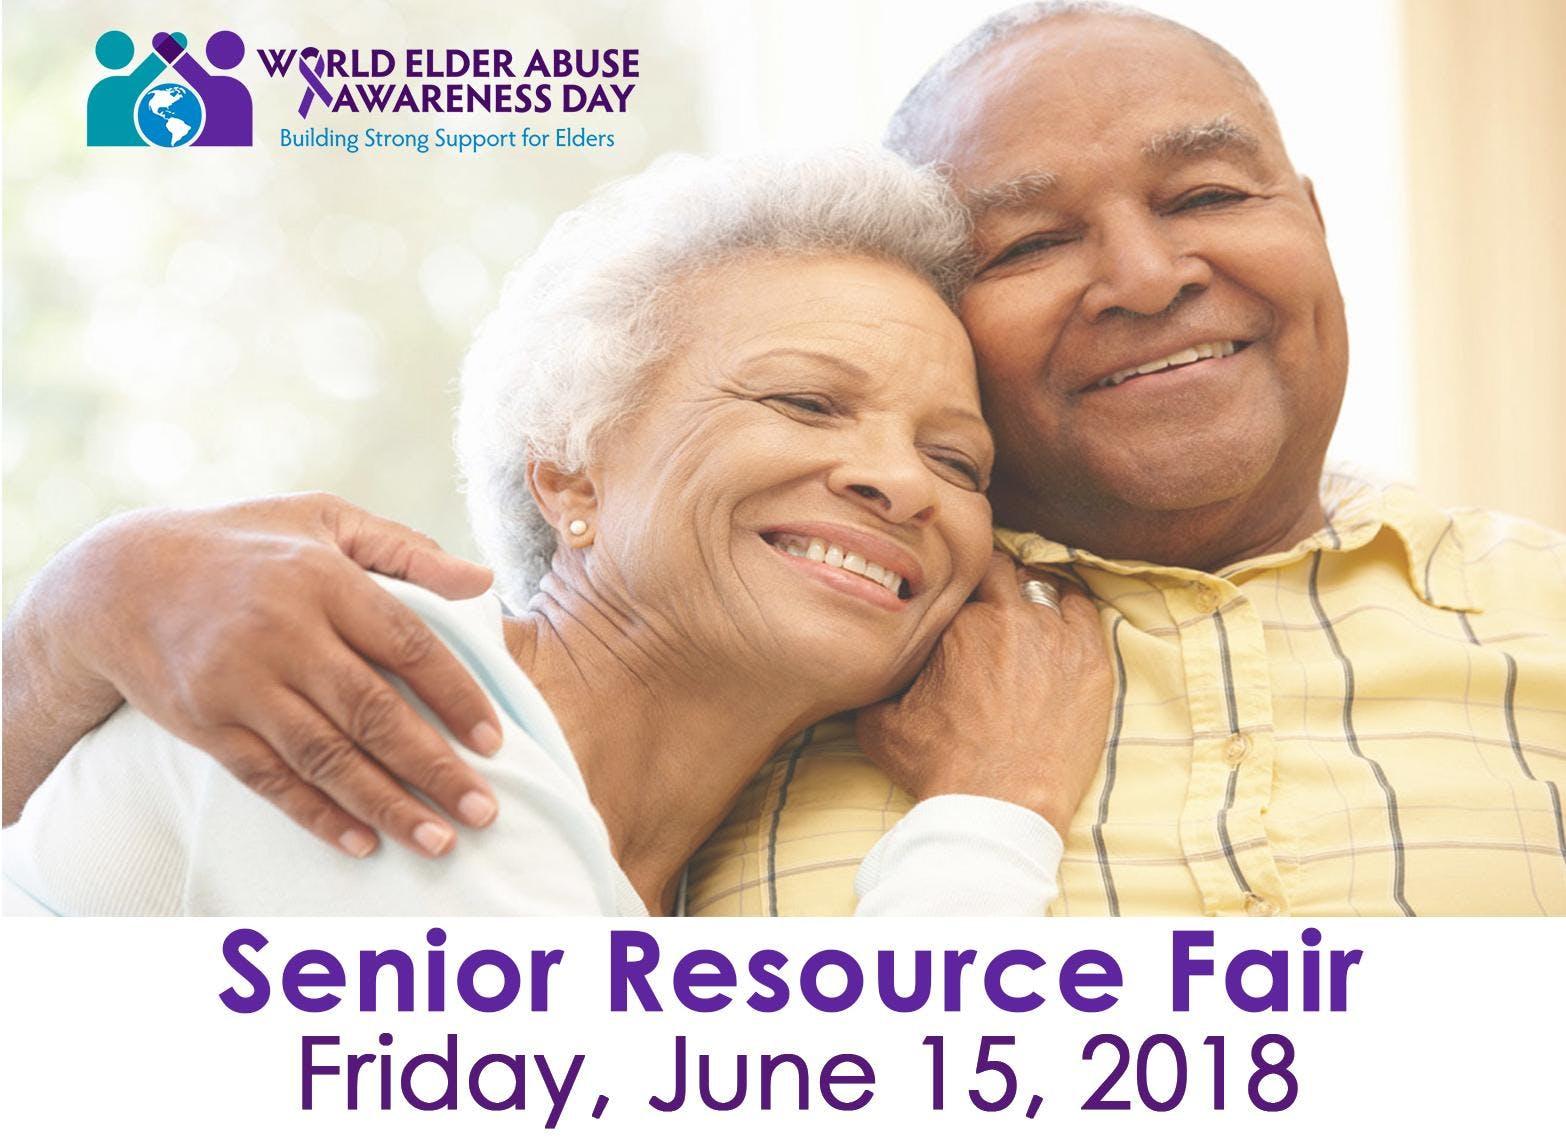 World Elder Abuse Awareness Day Event